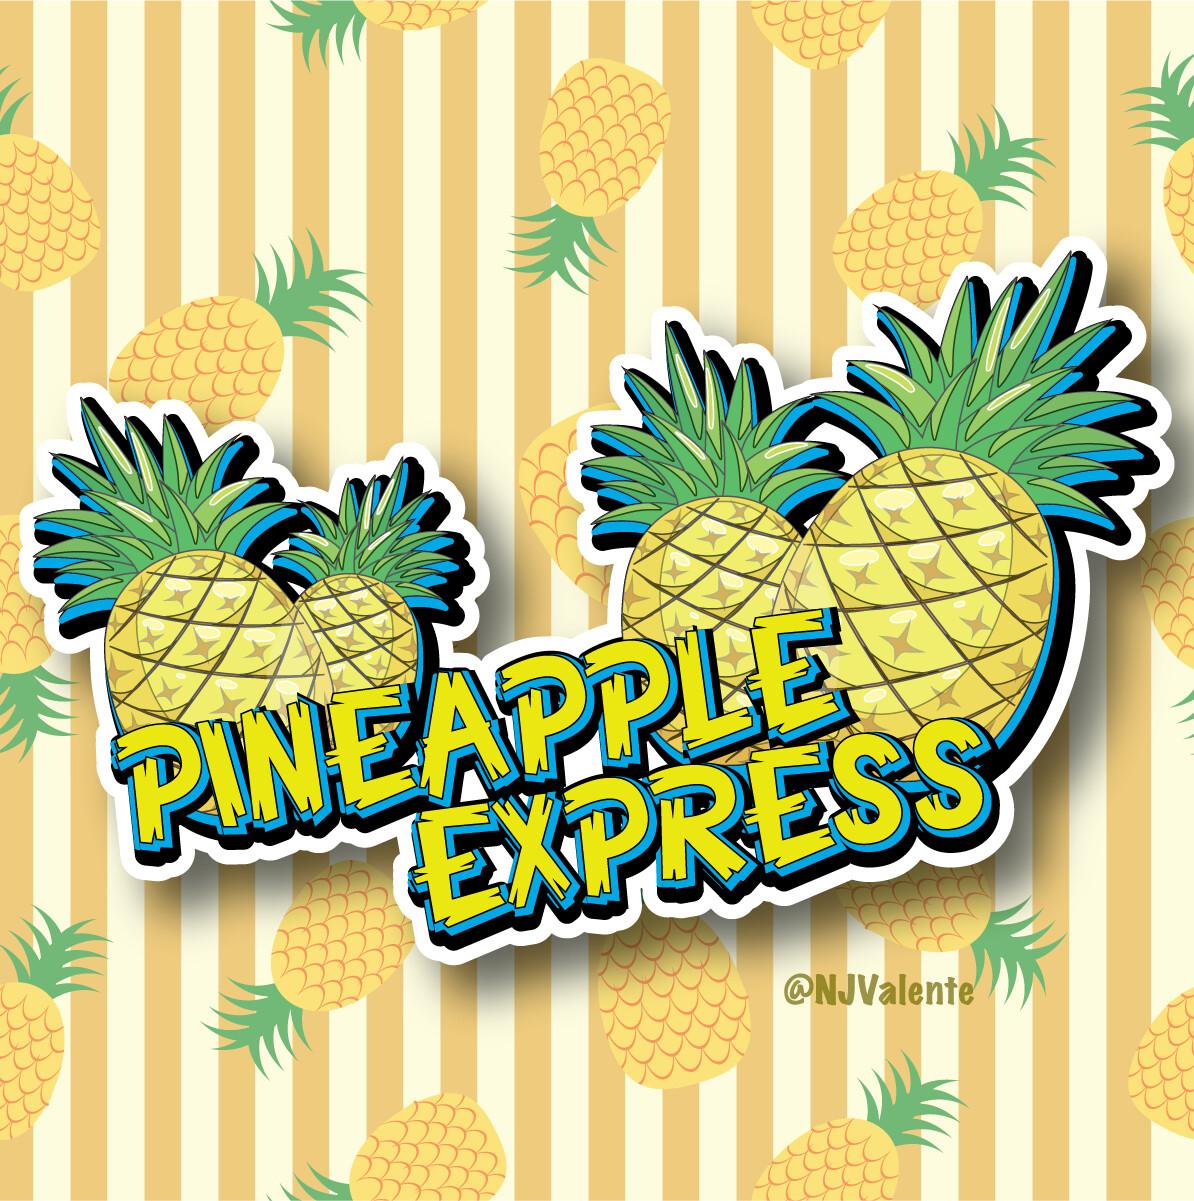 Pineapple Express Cannabis Logo Design